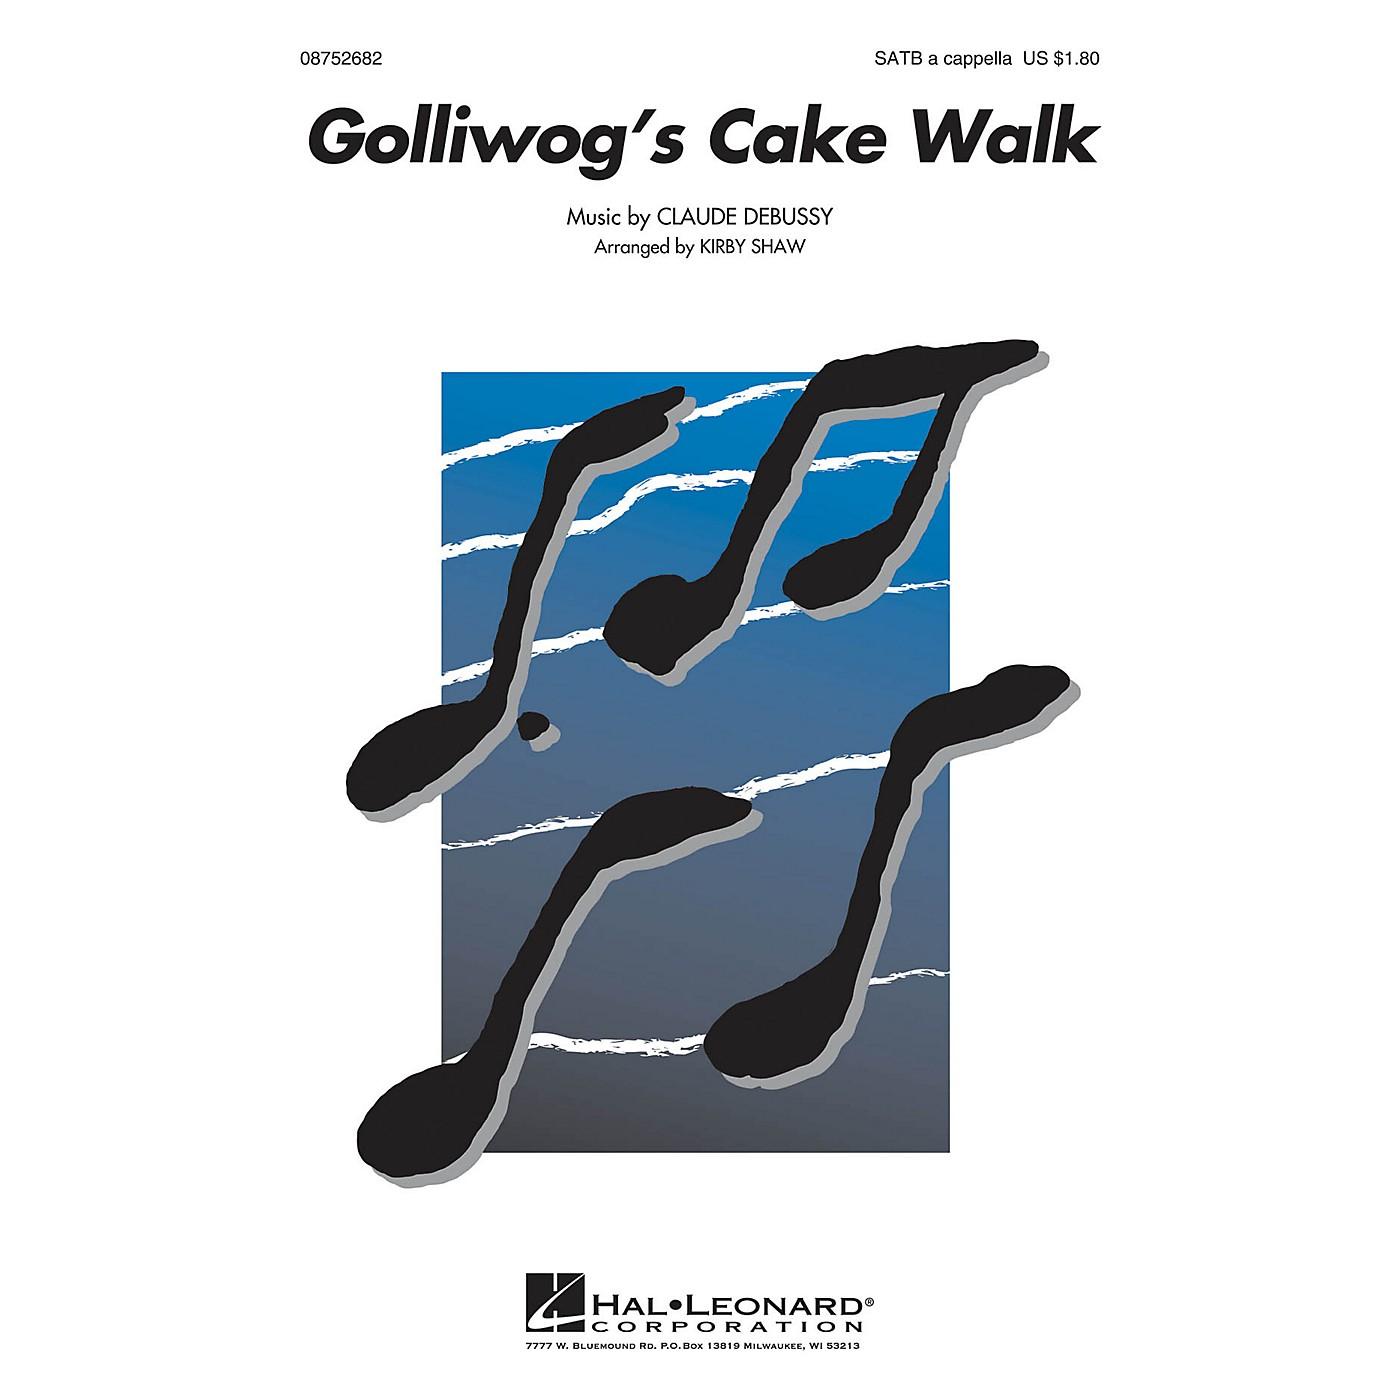 Hal Leonard Golliwogg's Cake Walk SATB a cappella arranged by Kirby Shaw thumbnail